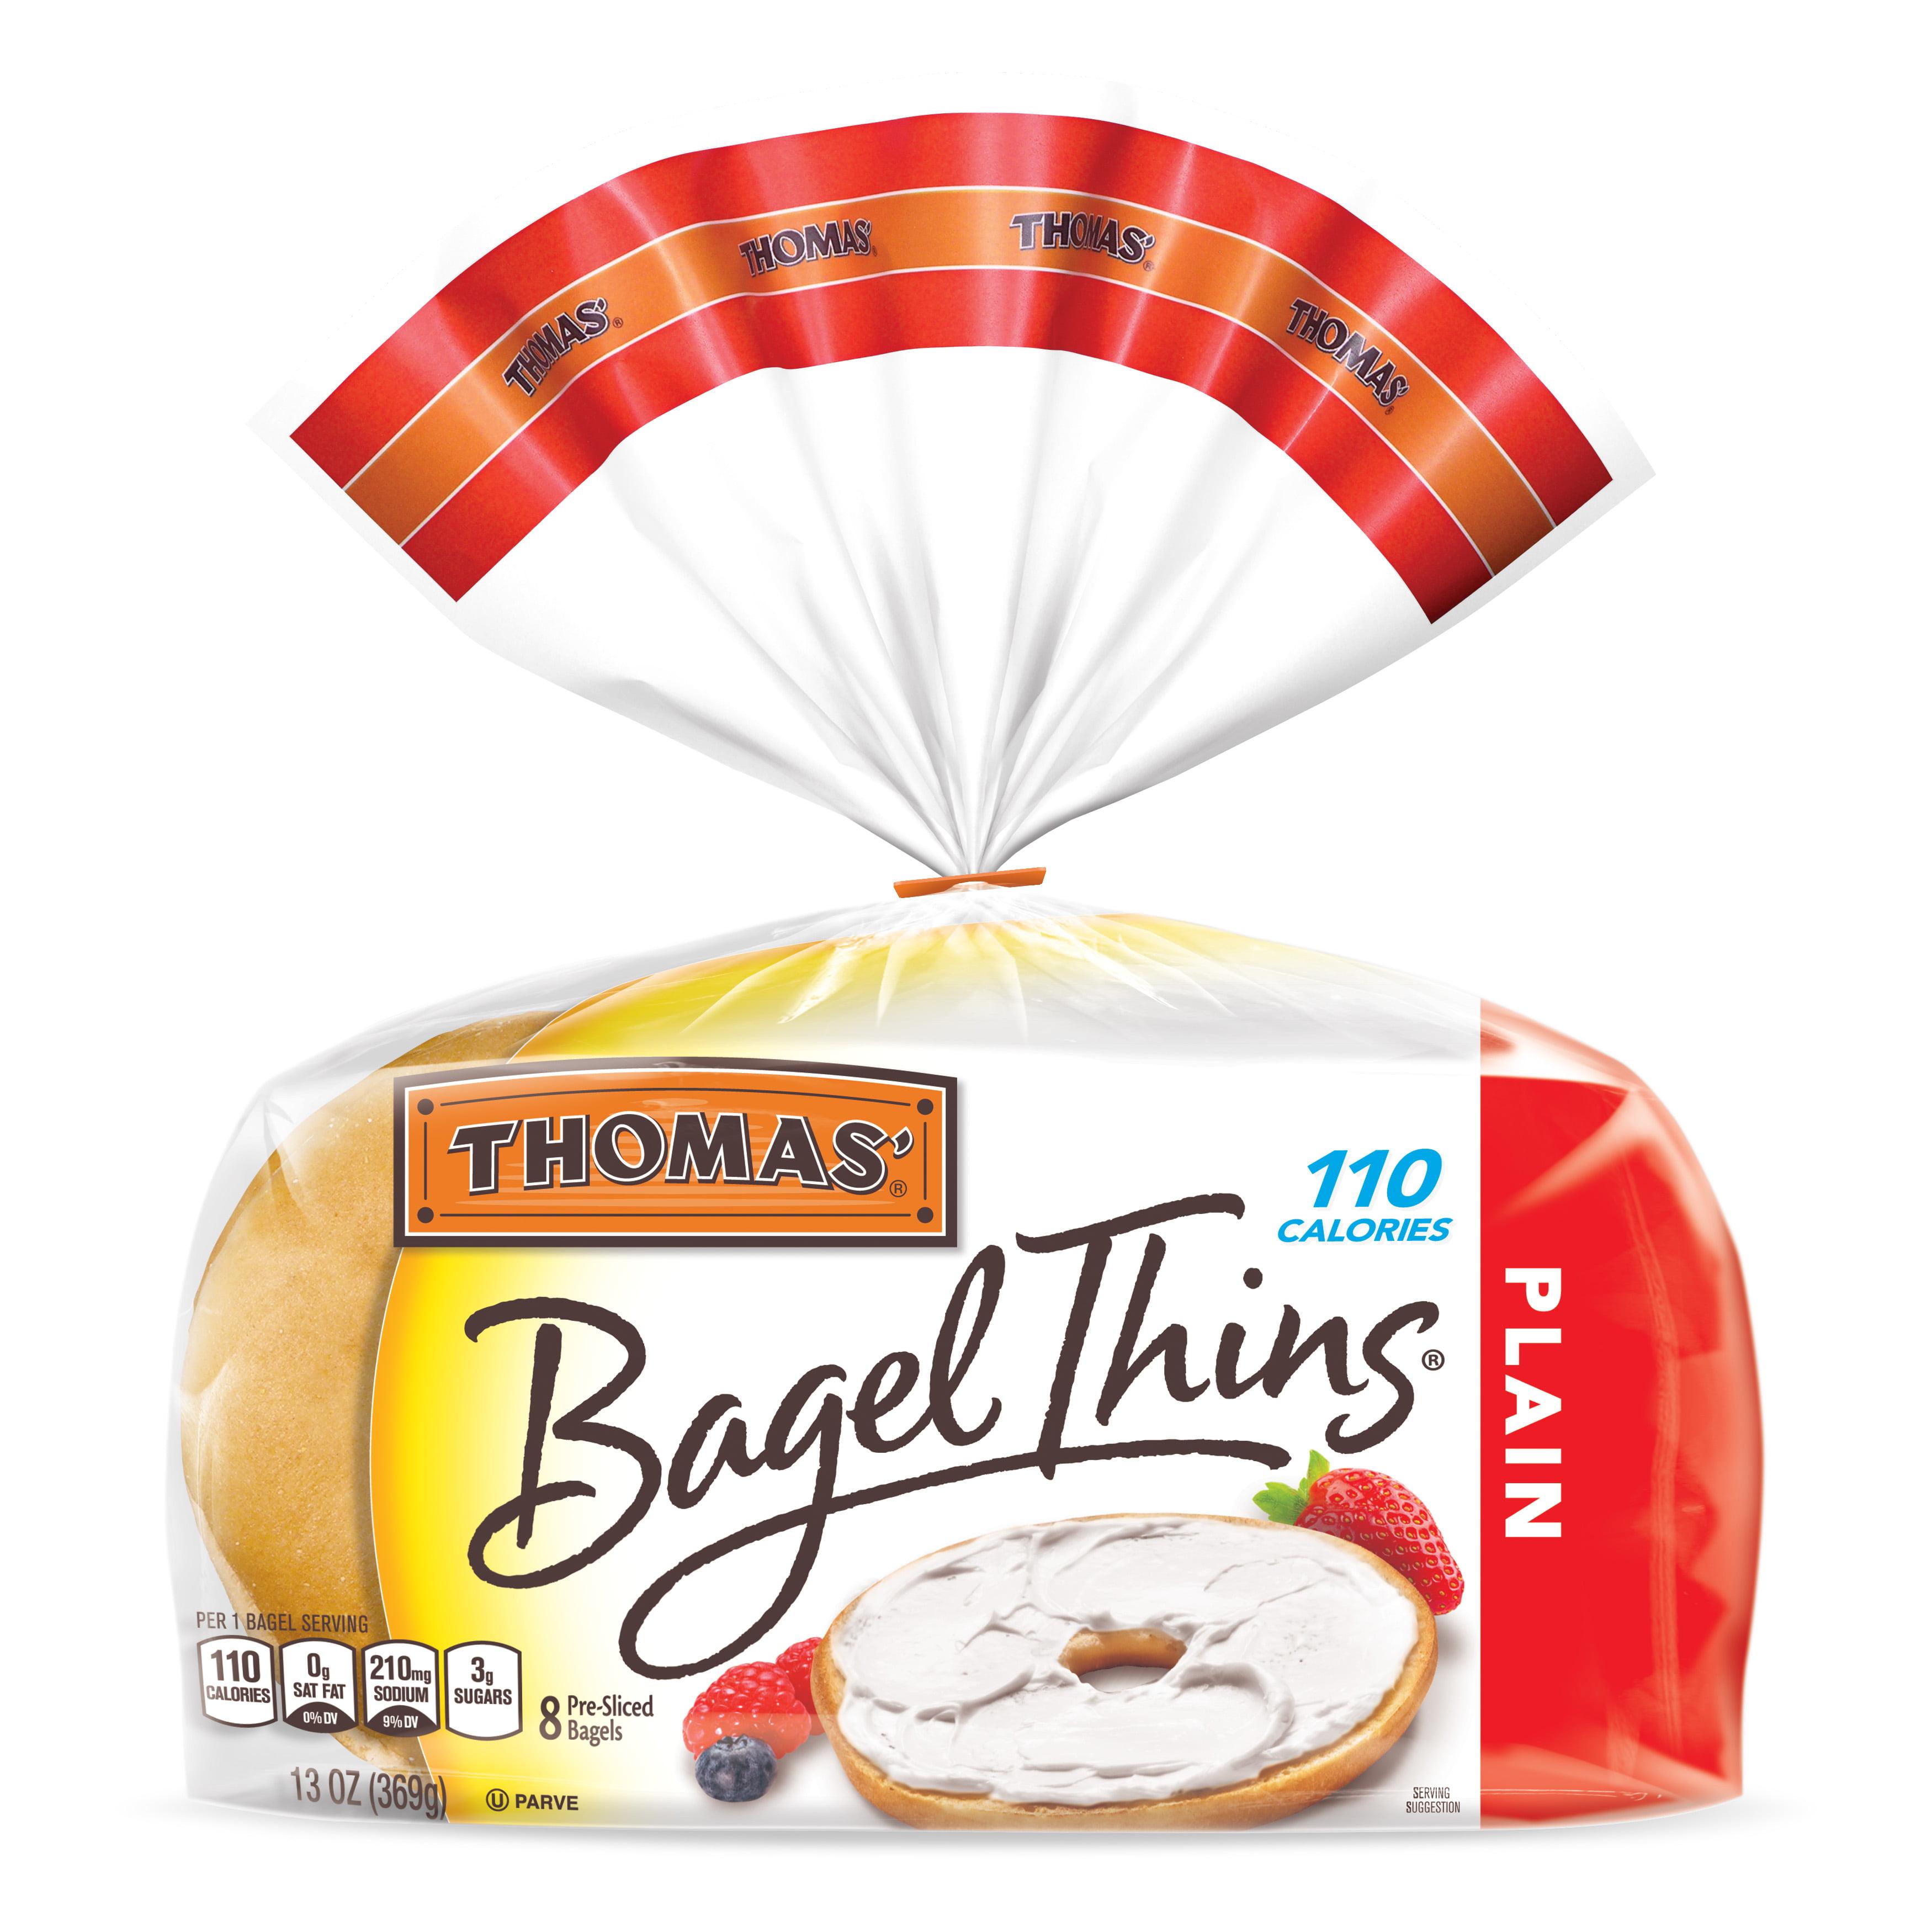 Thomas' Plain Bagel Thins, Only 110 Calories, 8 count, 13 oz